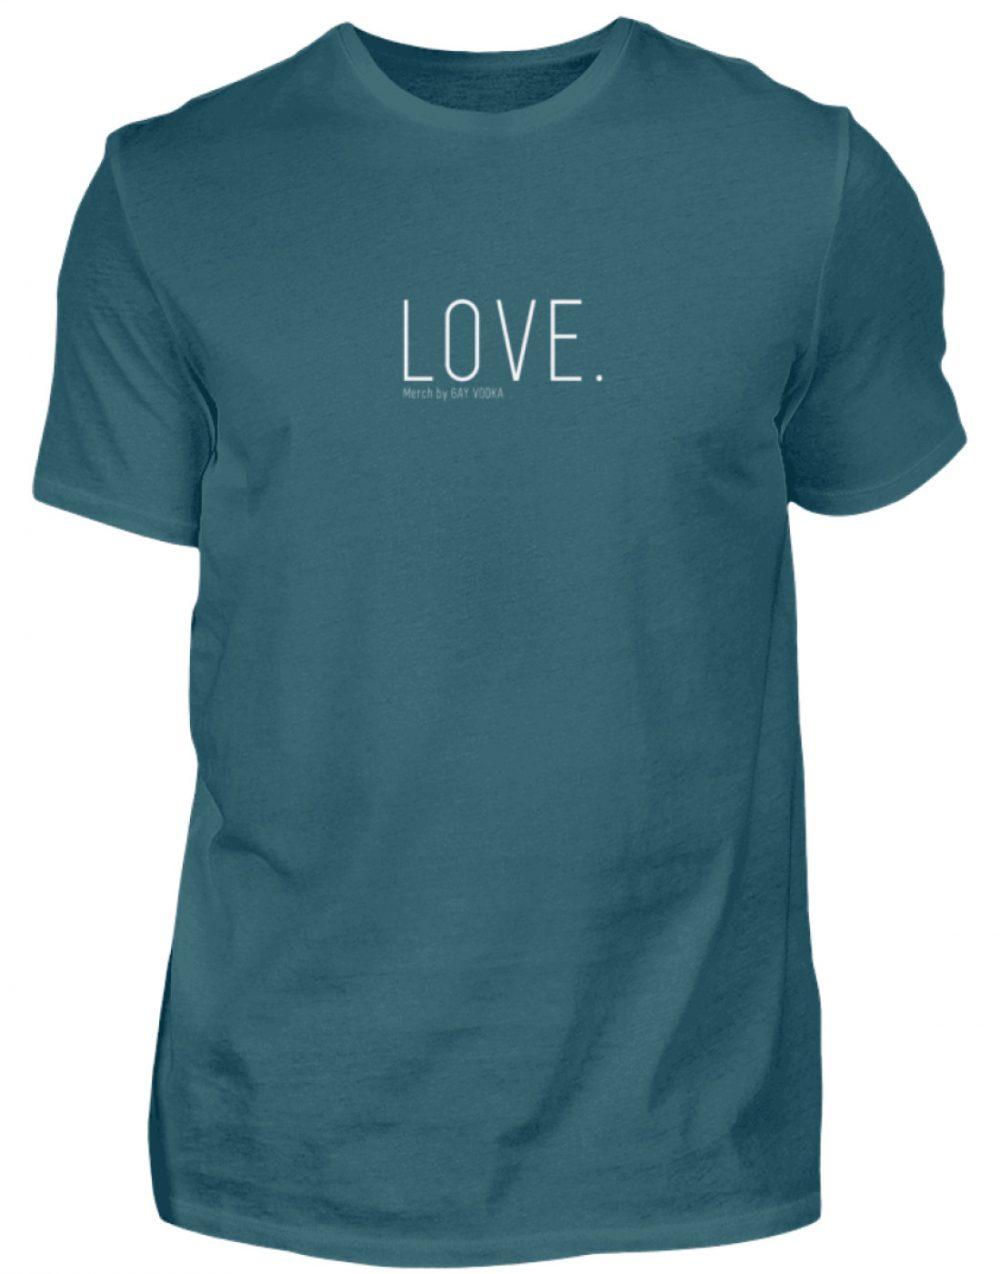 LOVE. - Herren Shirt-1096